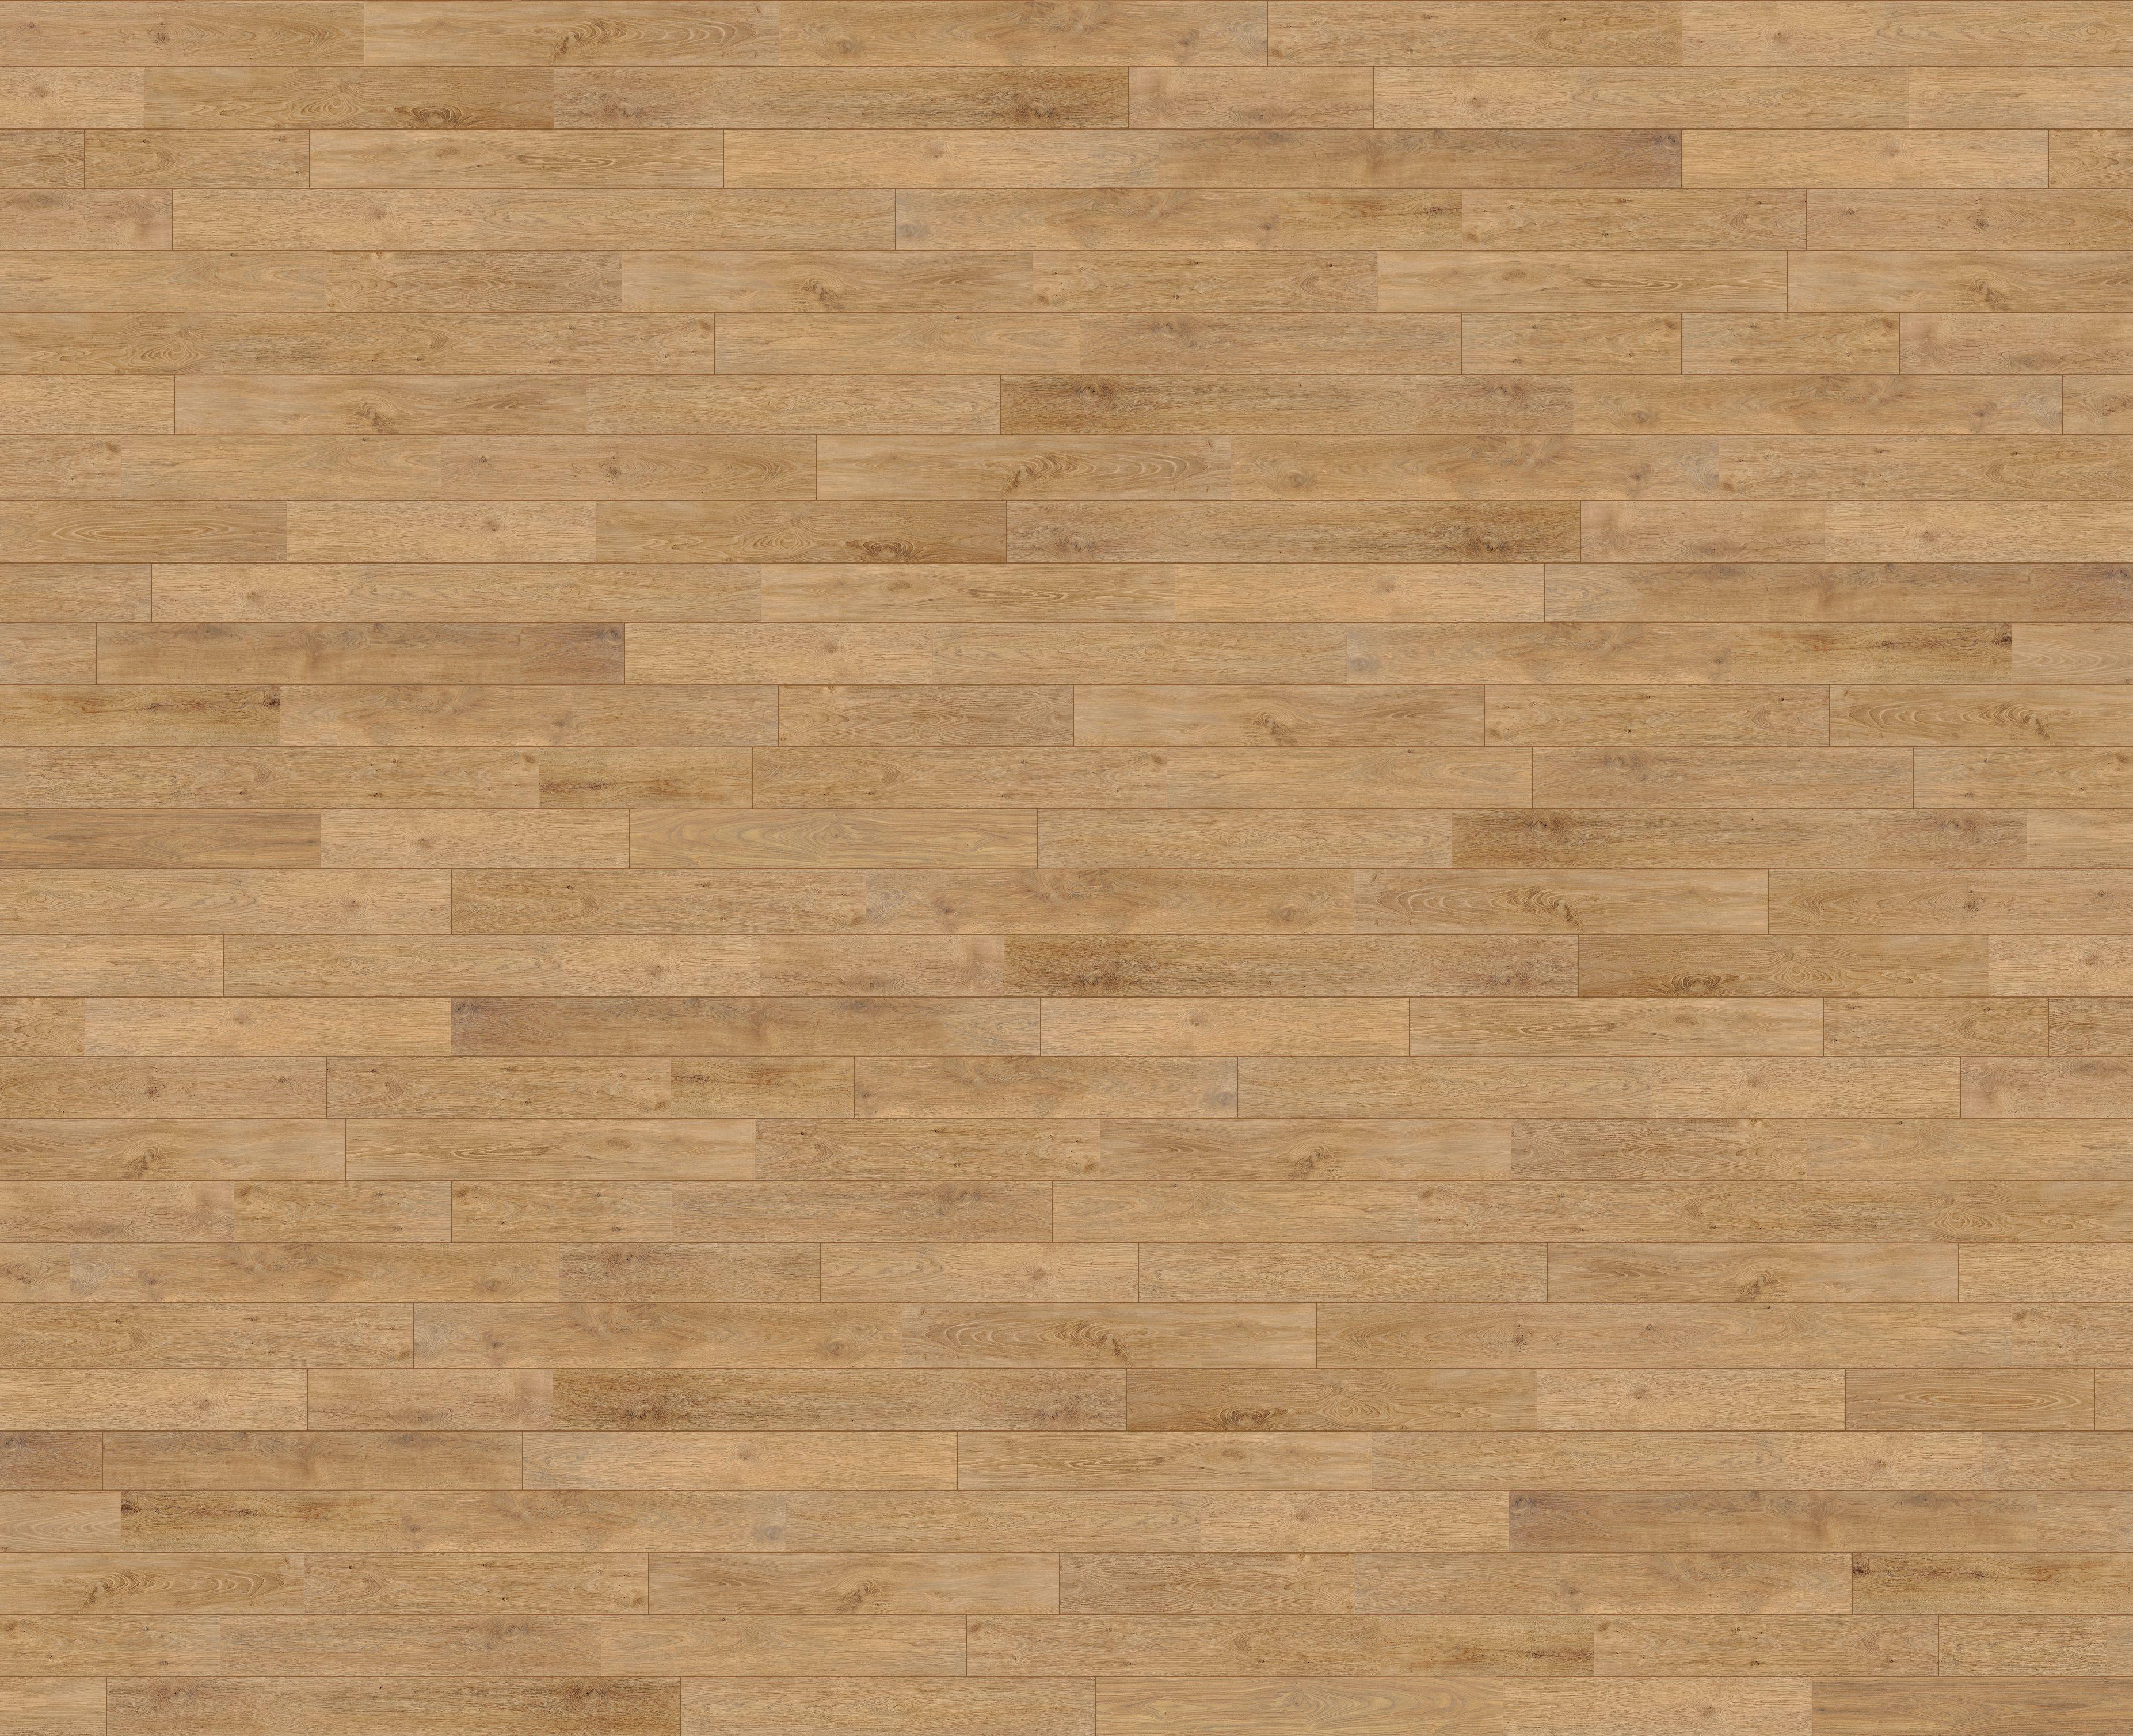 Marvelous Basketball Hardwood Floor Texture Inspiration 520416 Floor Design